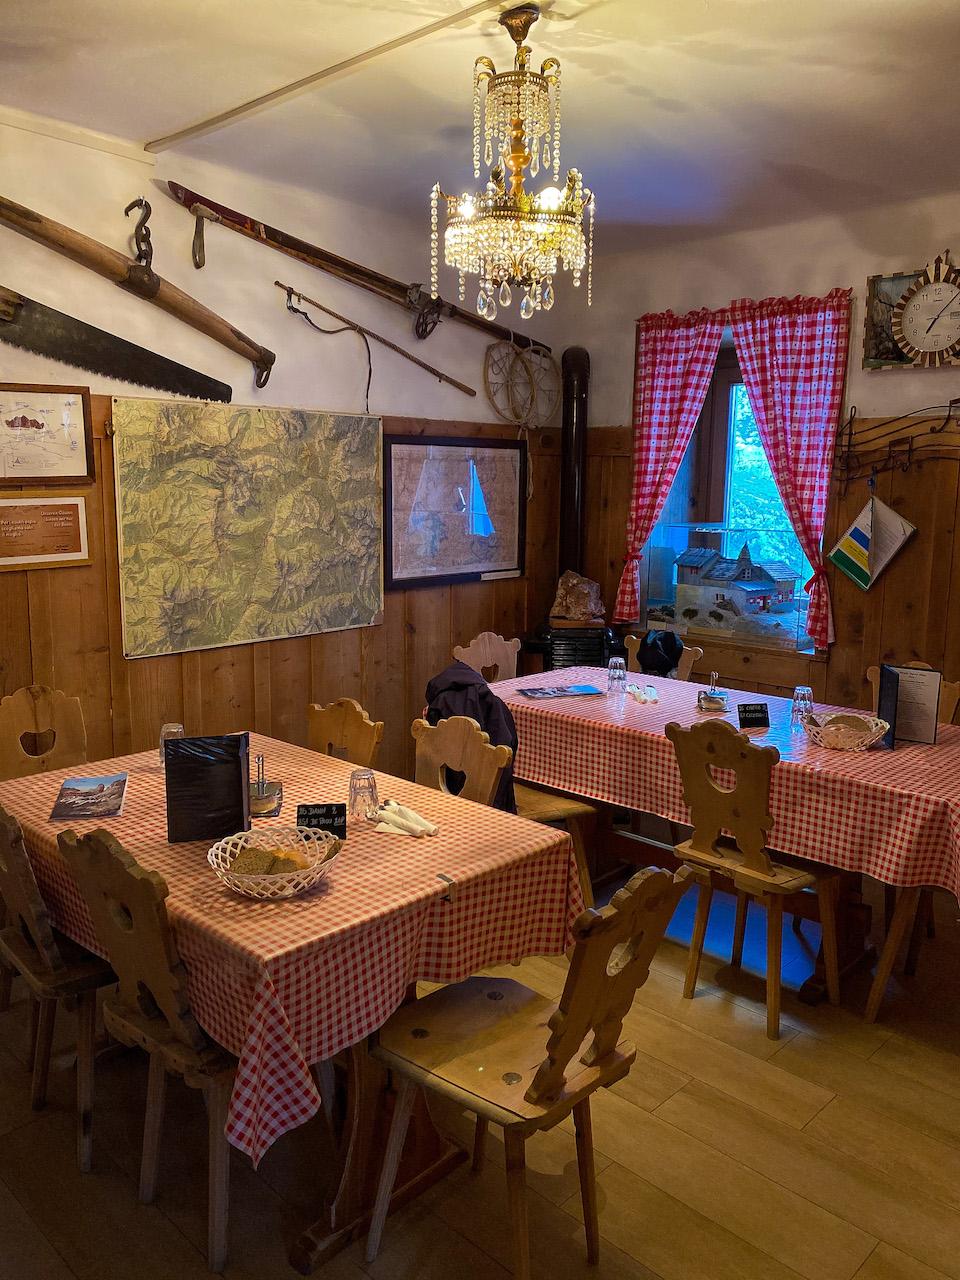 huttentocht in de dolomieten, overnachten tips - rifigiol vajolet